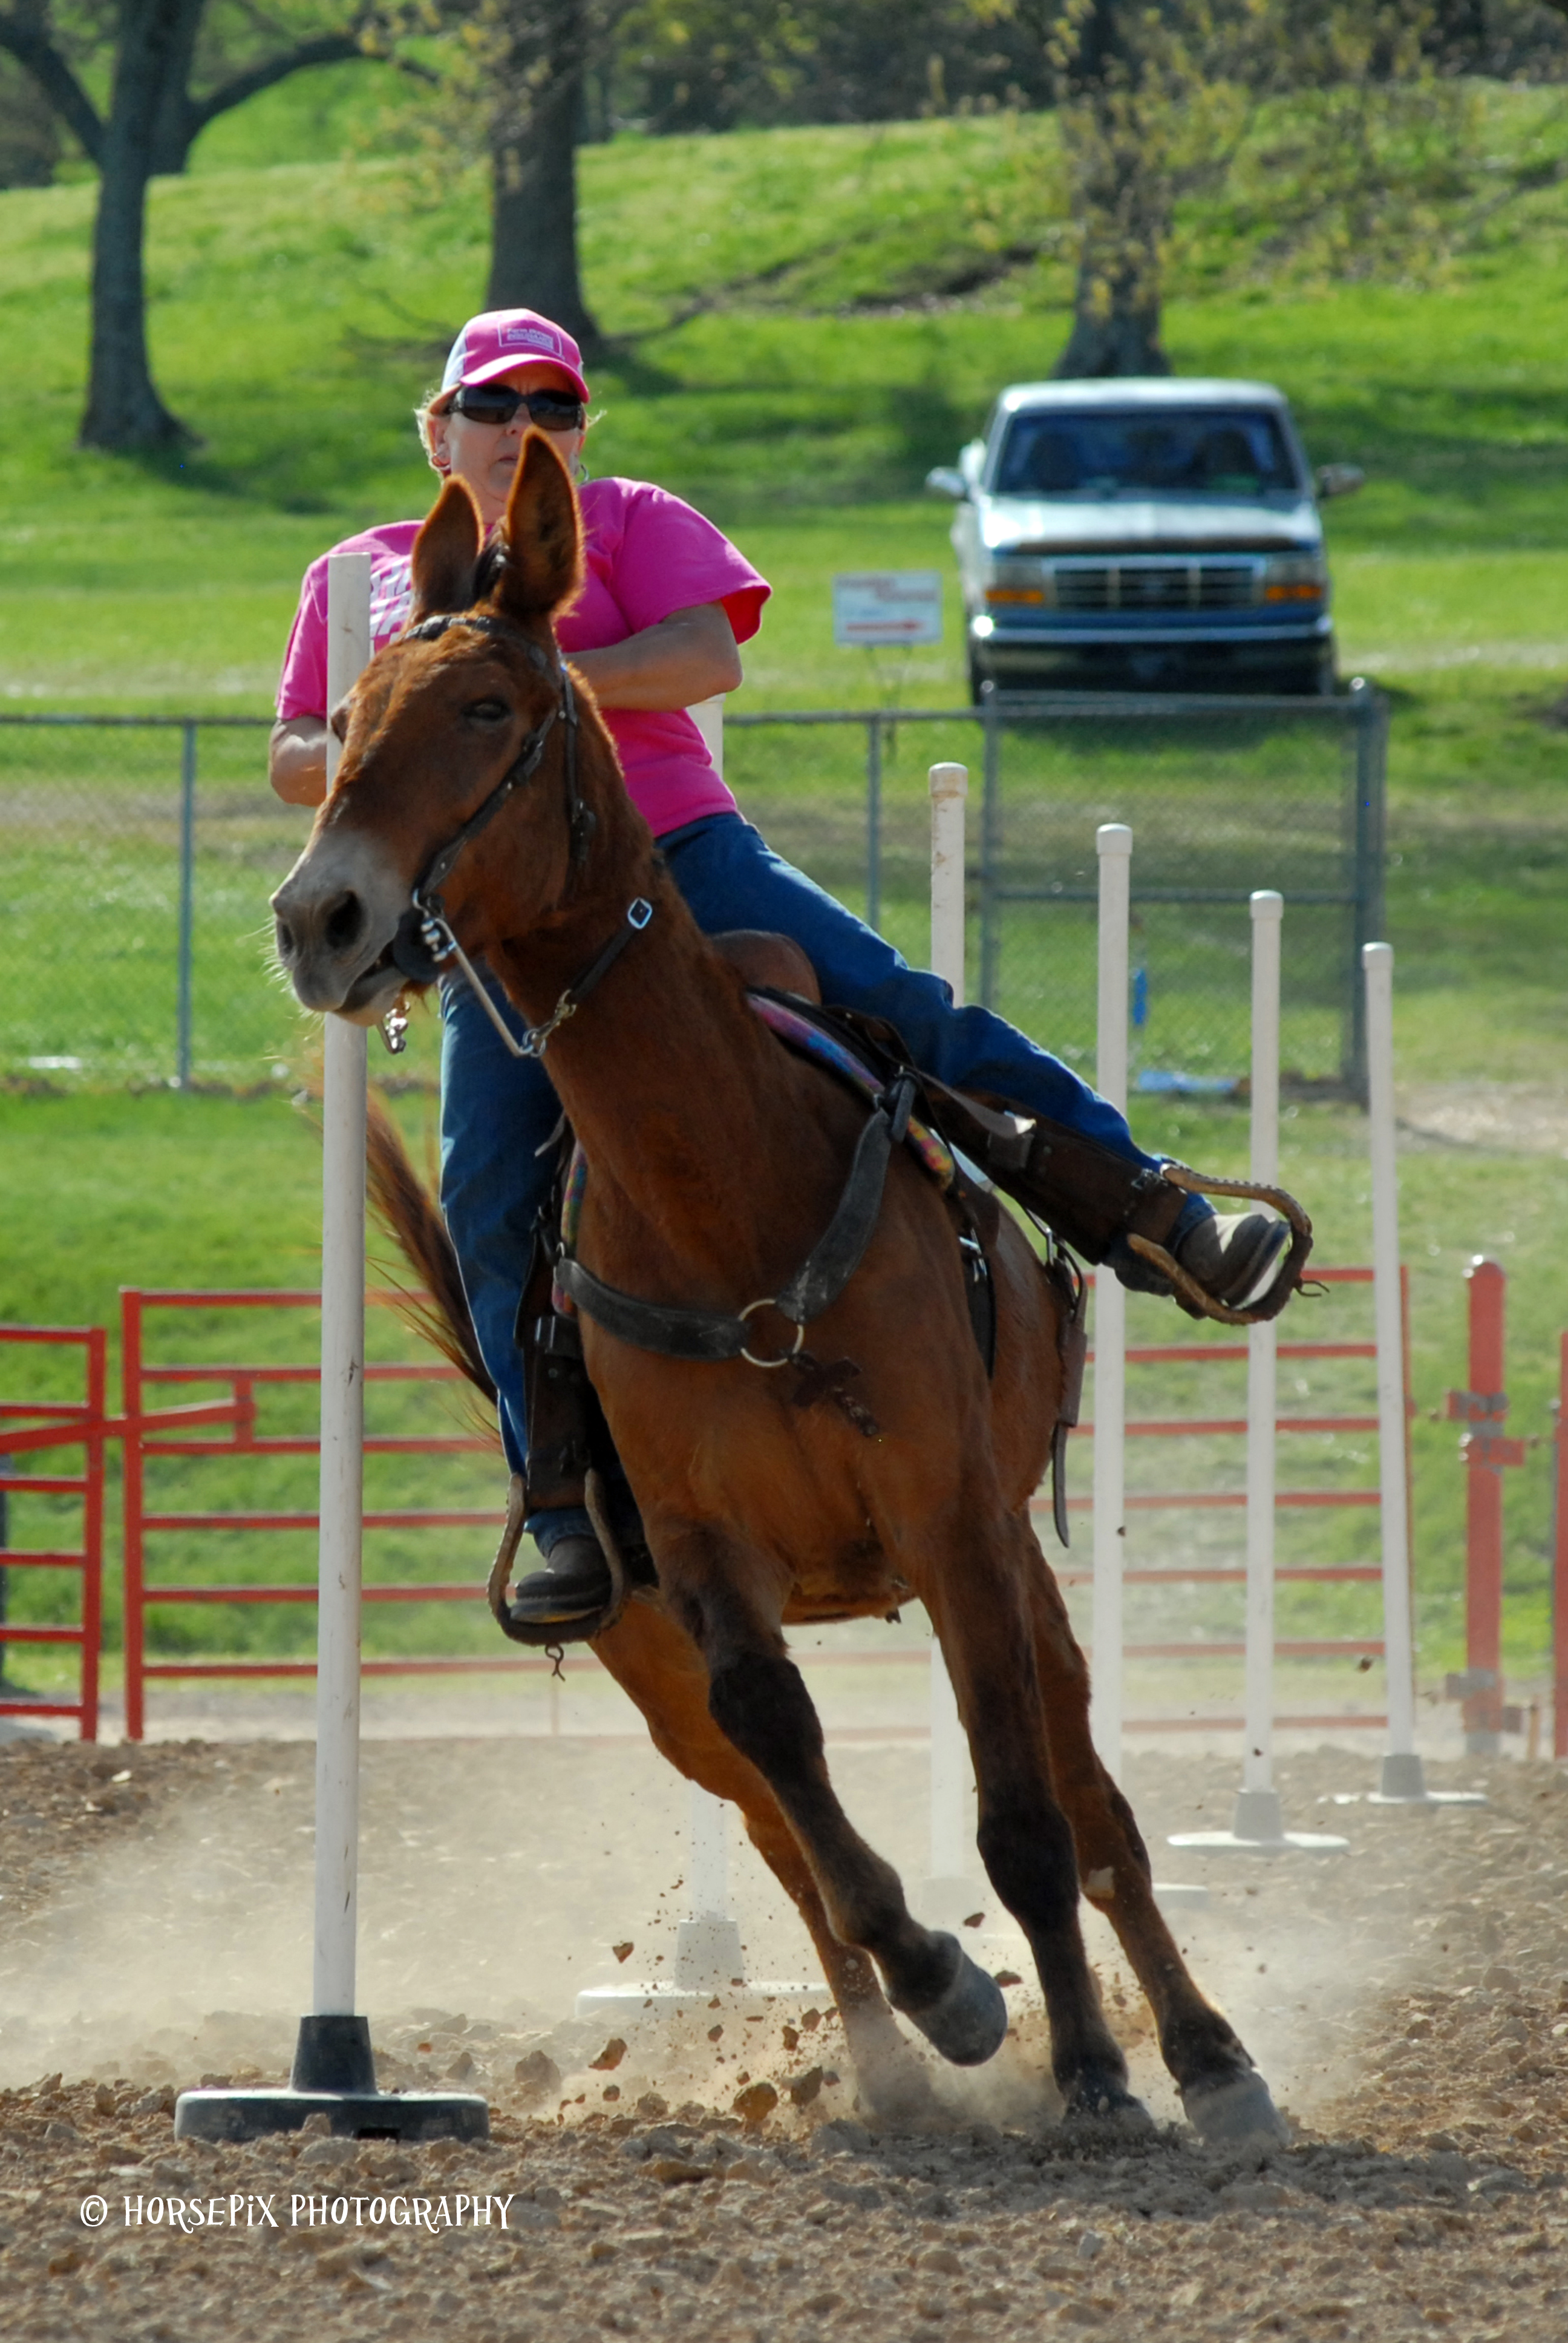 Riding Mule Show – Sunday 11:00 AM